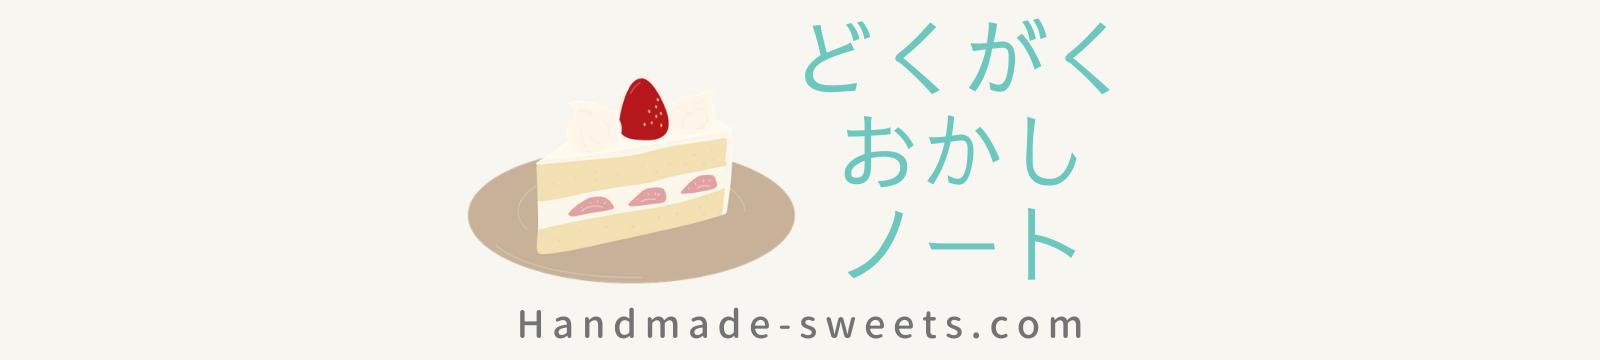 Handmade Sweets.com